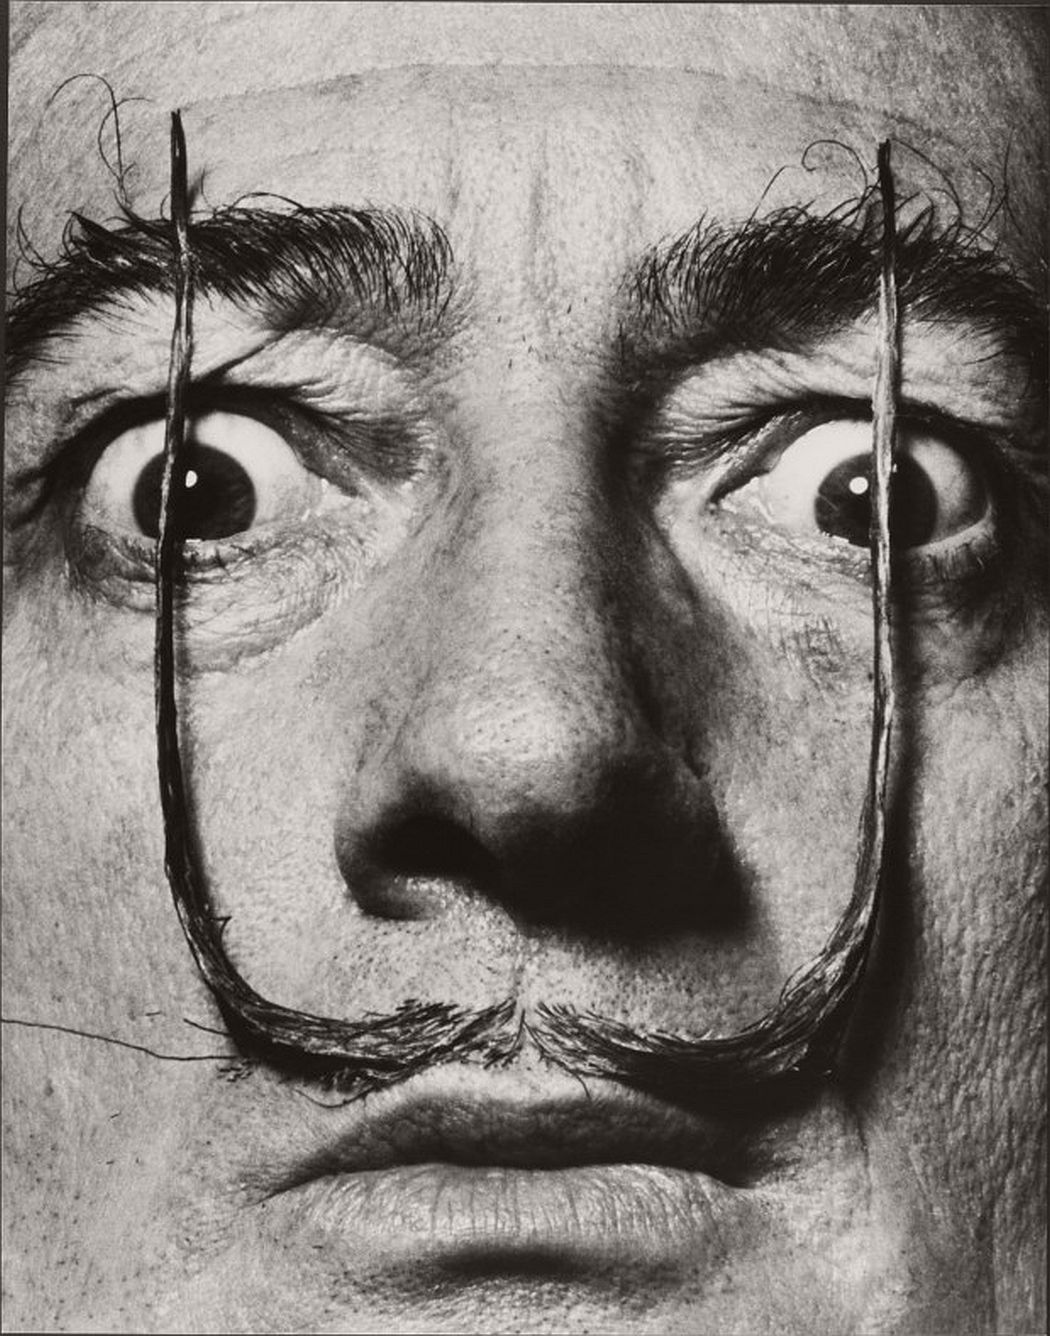 portrait-photographer-philippe-halsman-11